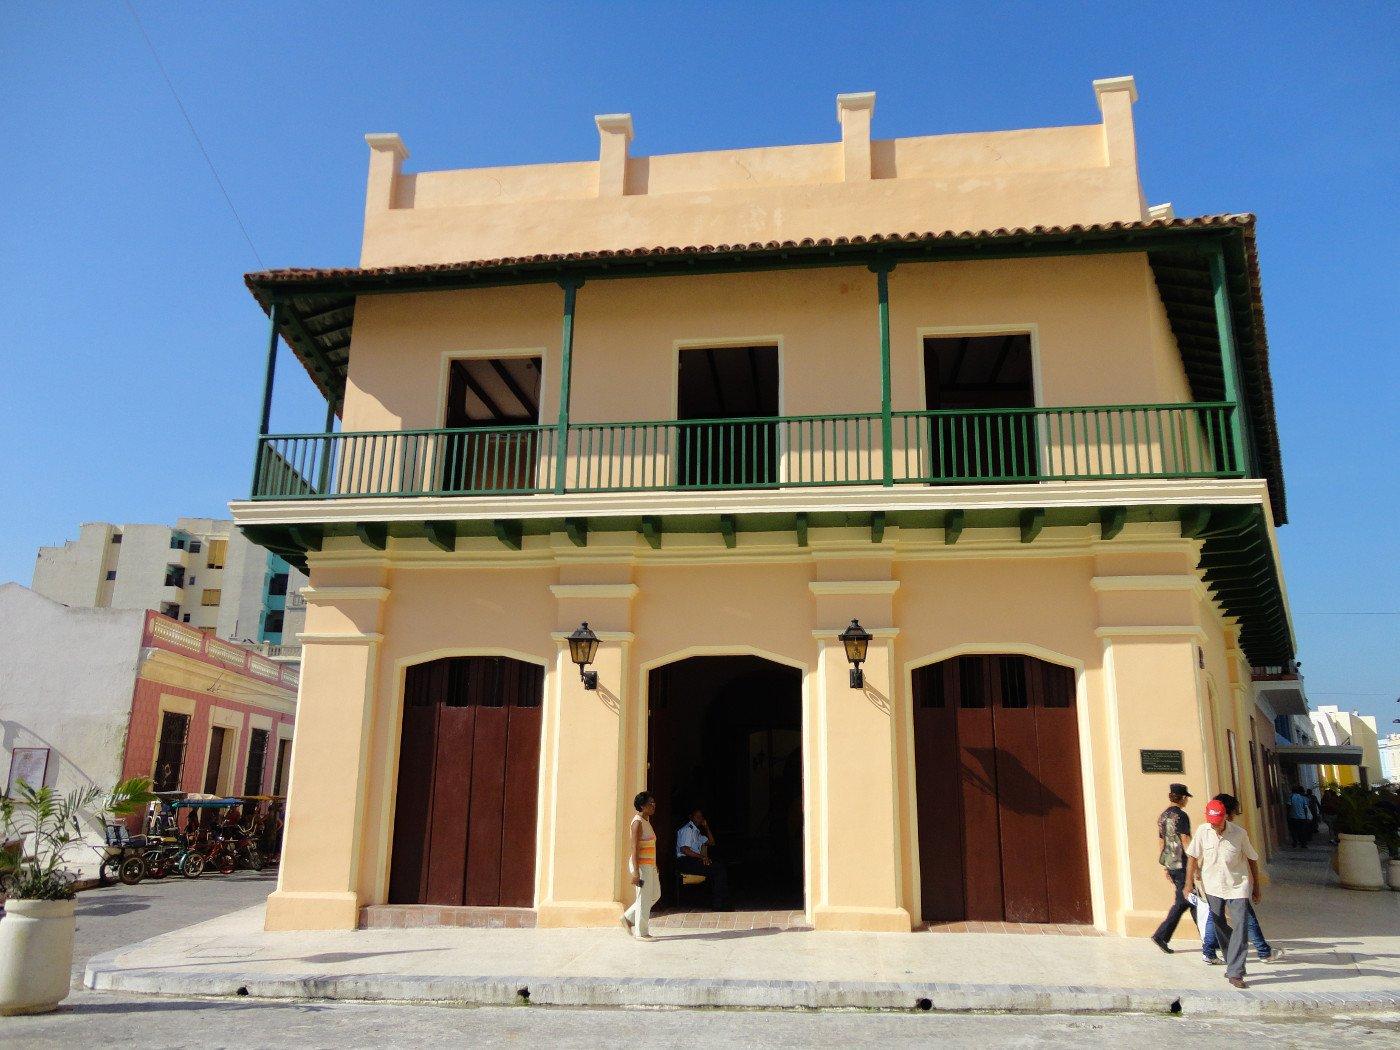 Kuba_Hotel_Camino de Hierro_2015